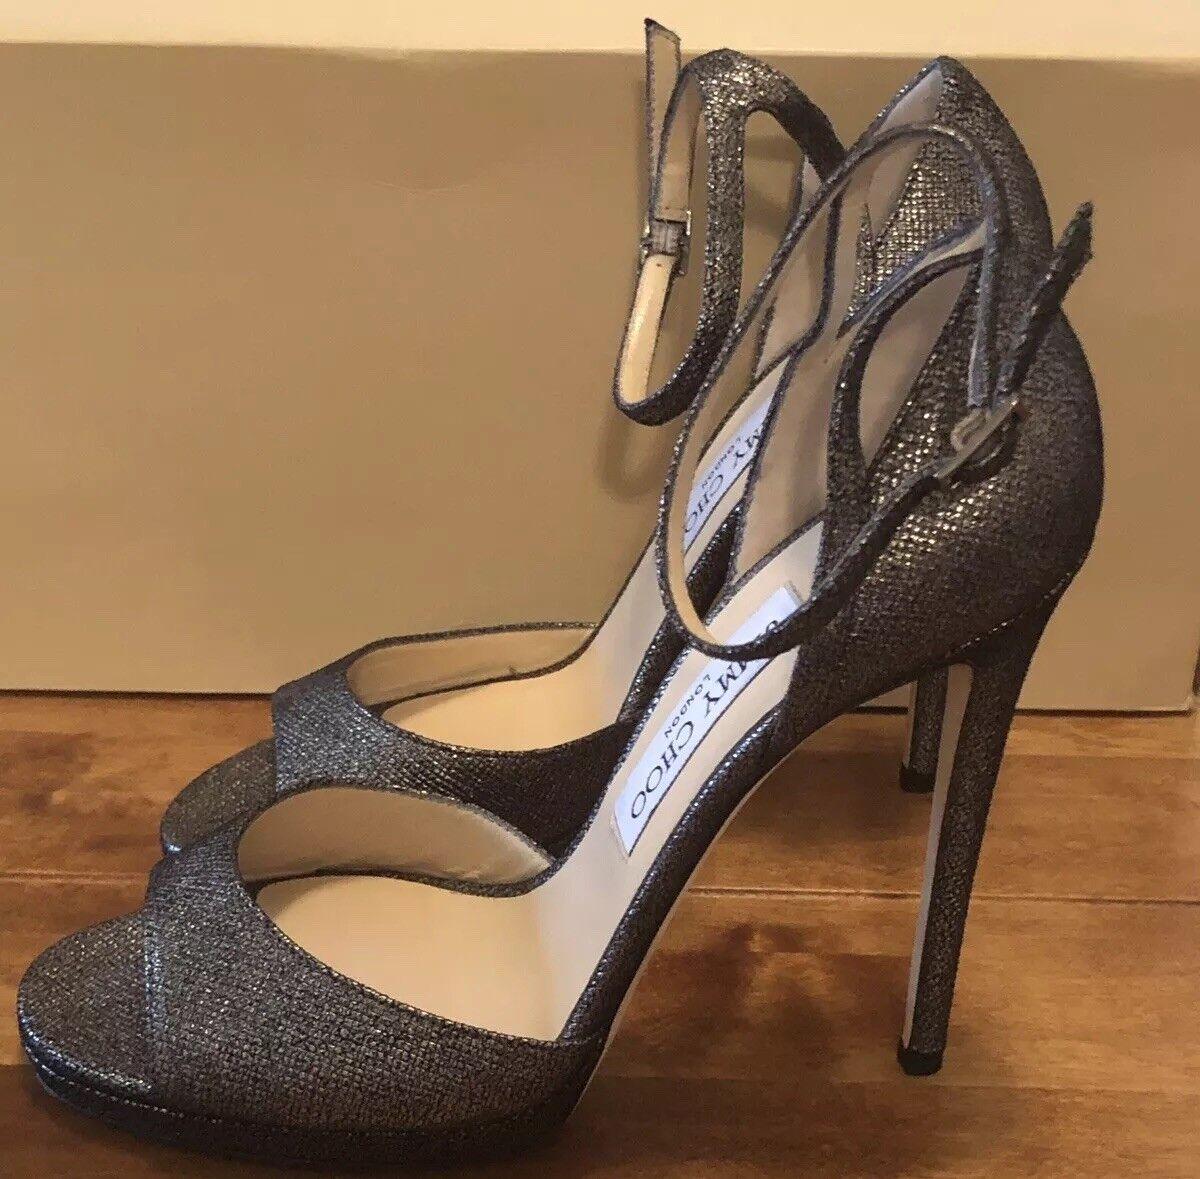 Jimmy Choo Black & Silver Glitter Lamé Fabric Peep-Toe Sandal UK 5 - Eu 38